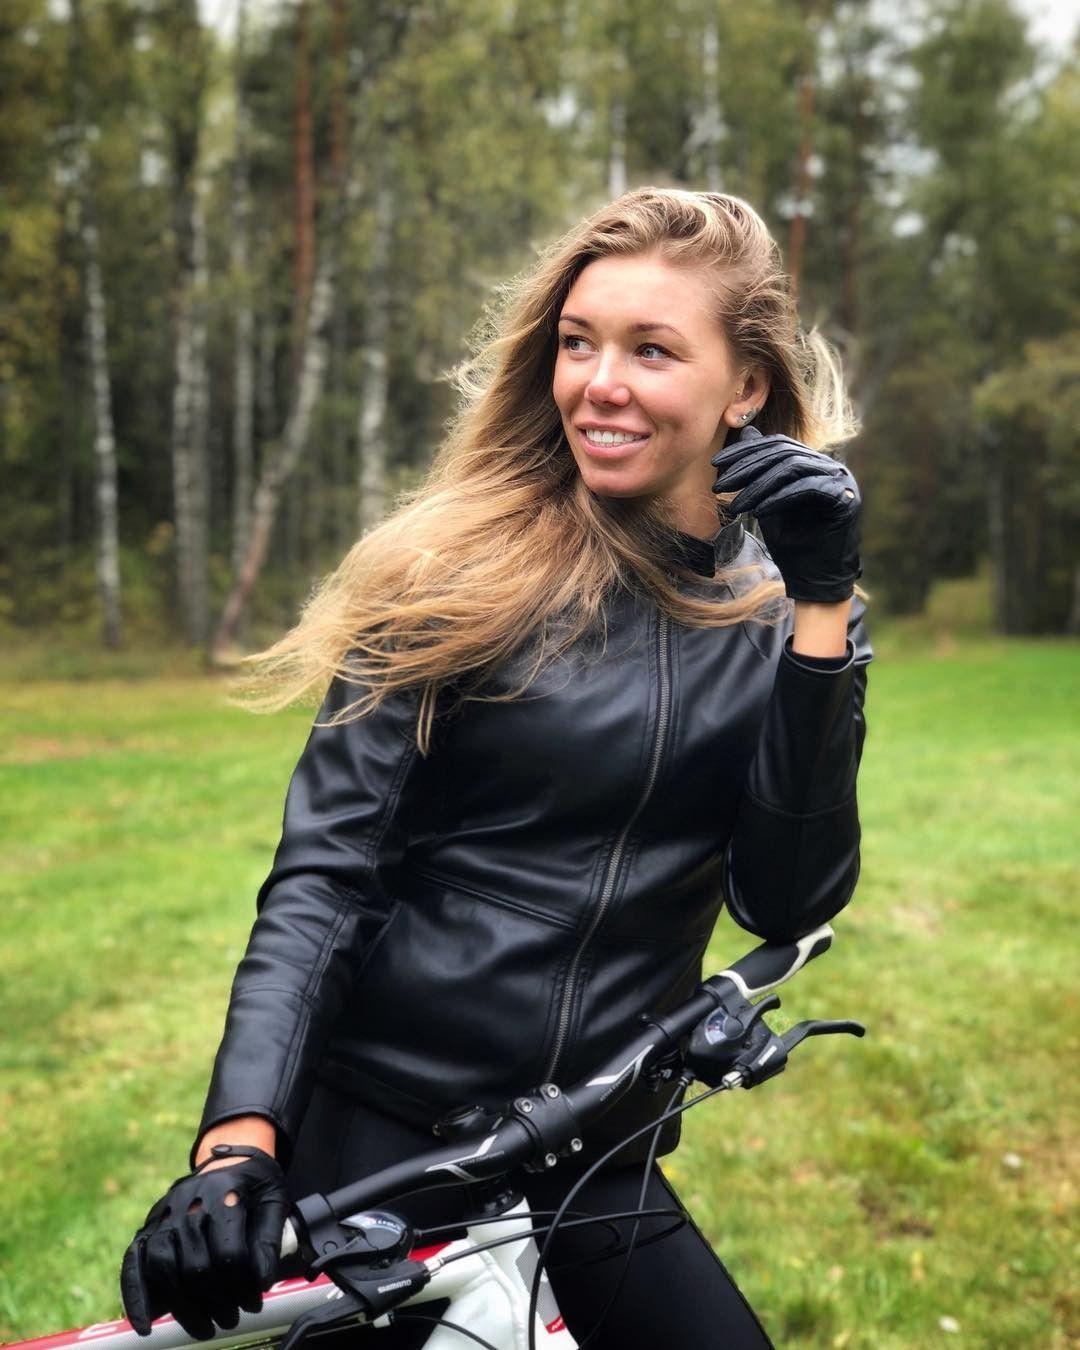 Pin Von Semen Semenov Auf Perchatki Lederhandschuhe Leder